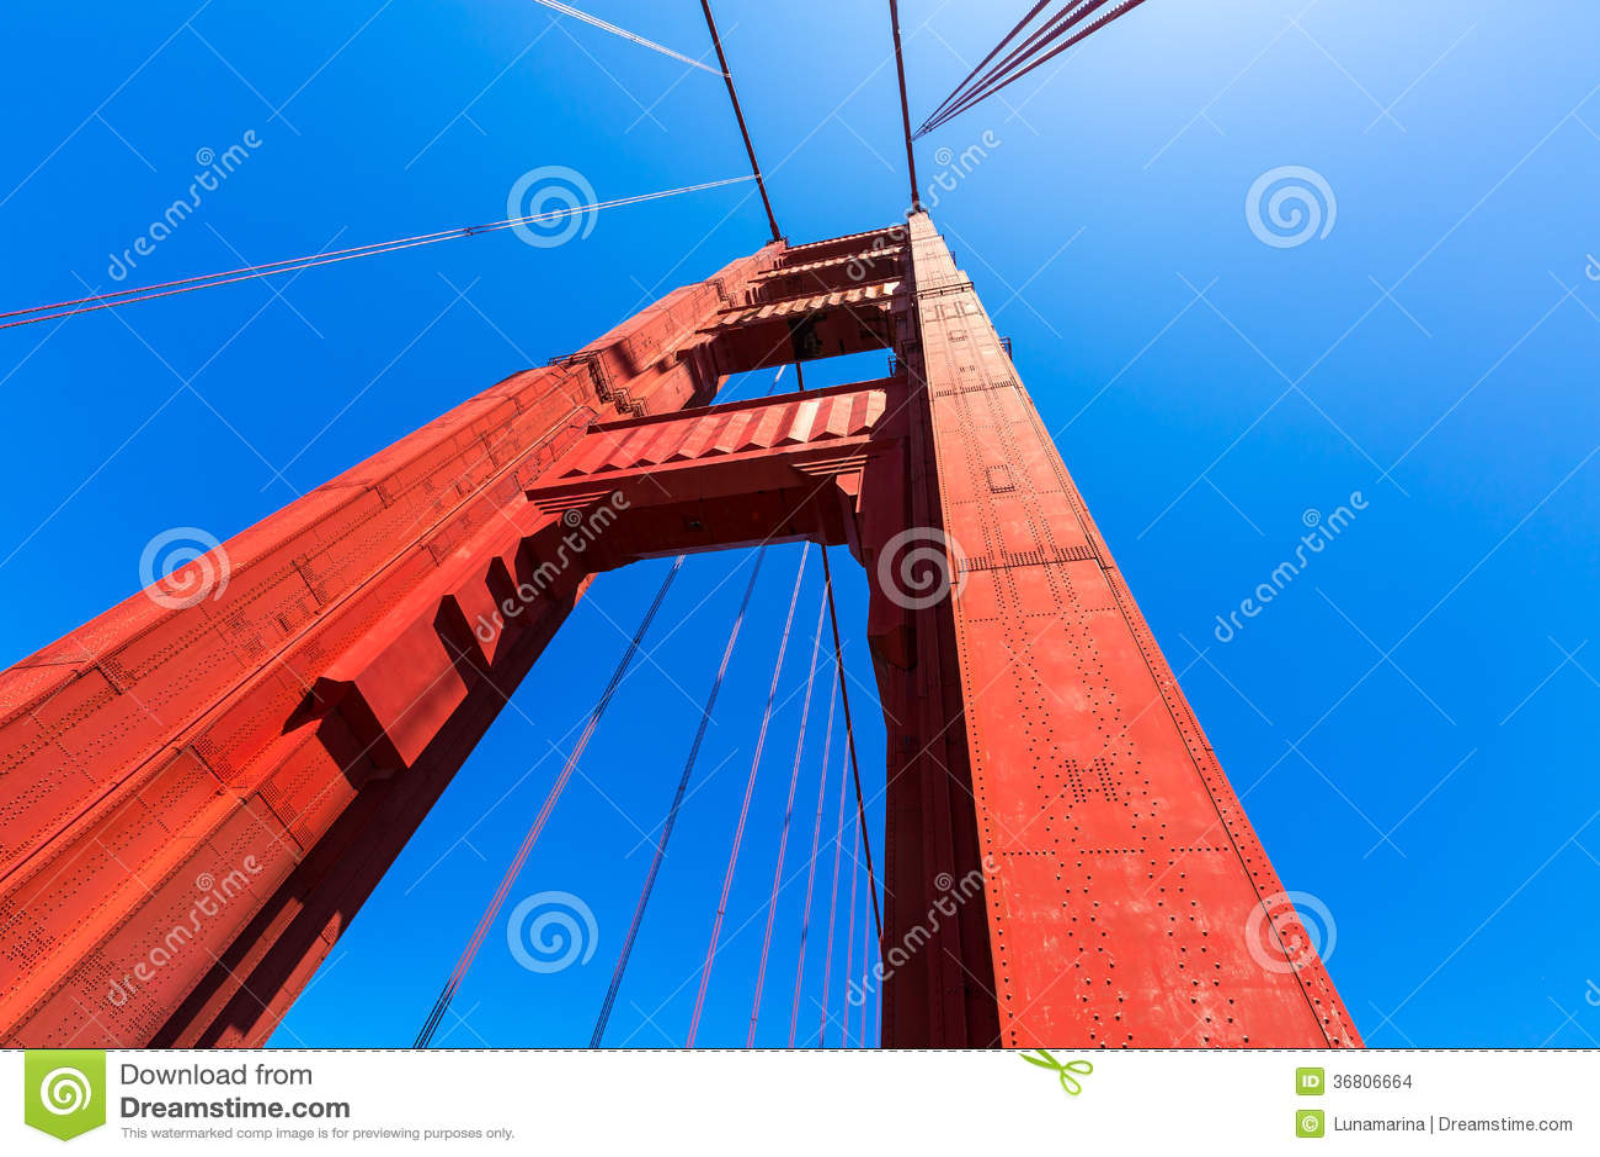 Dettagli di golden gate bridge in San Francisco California